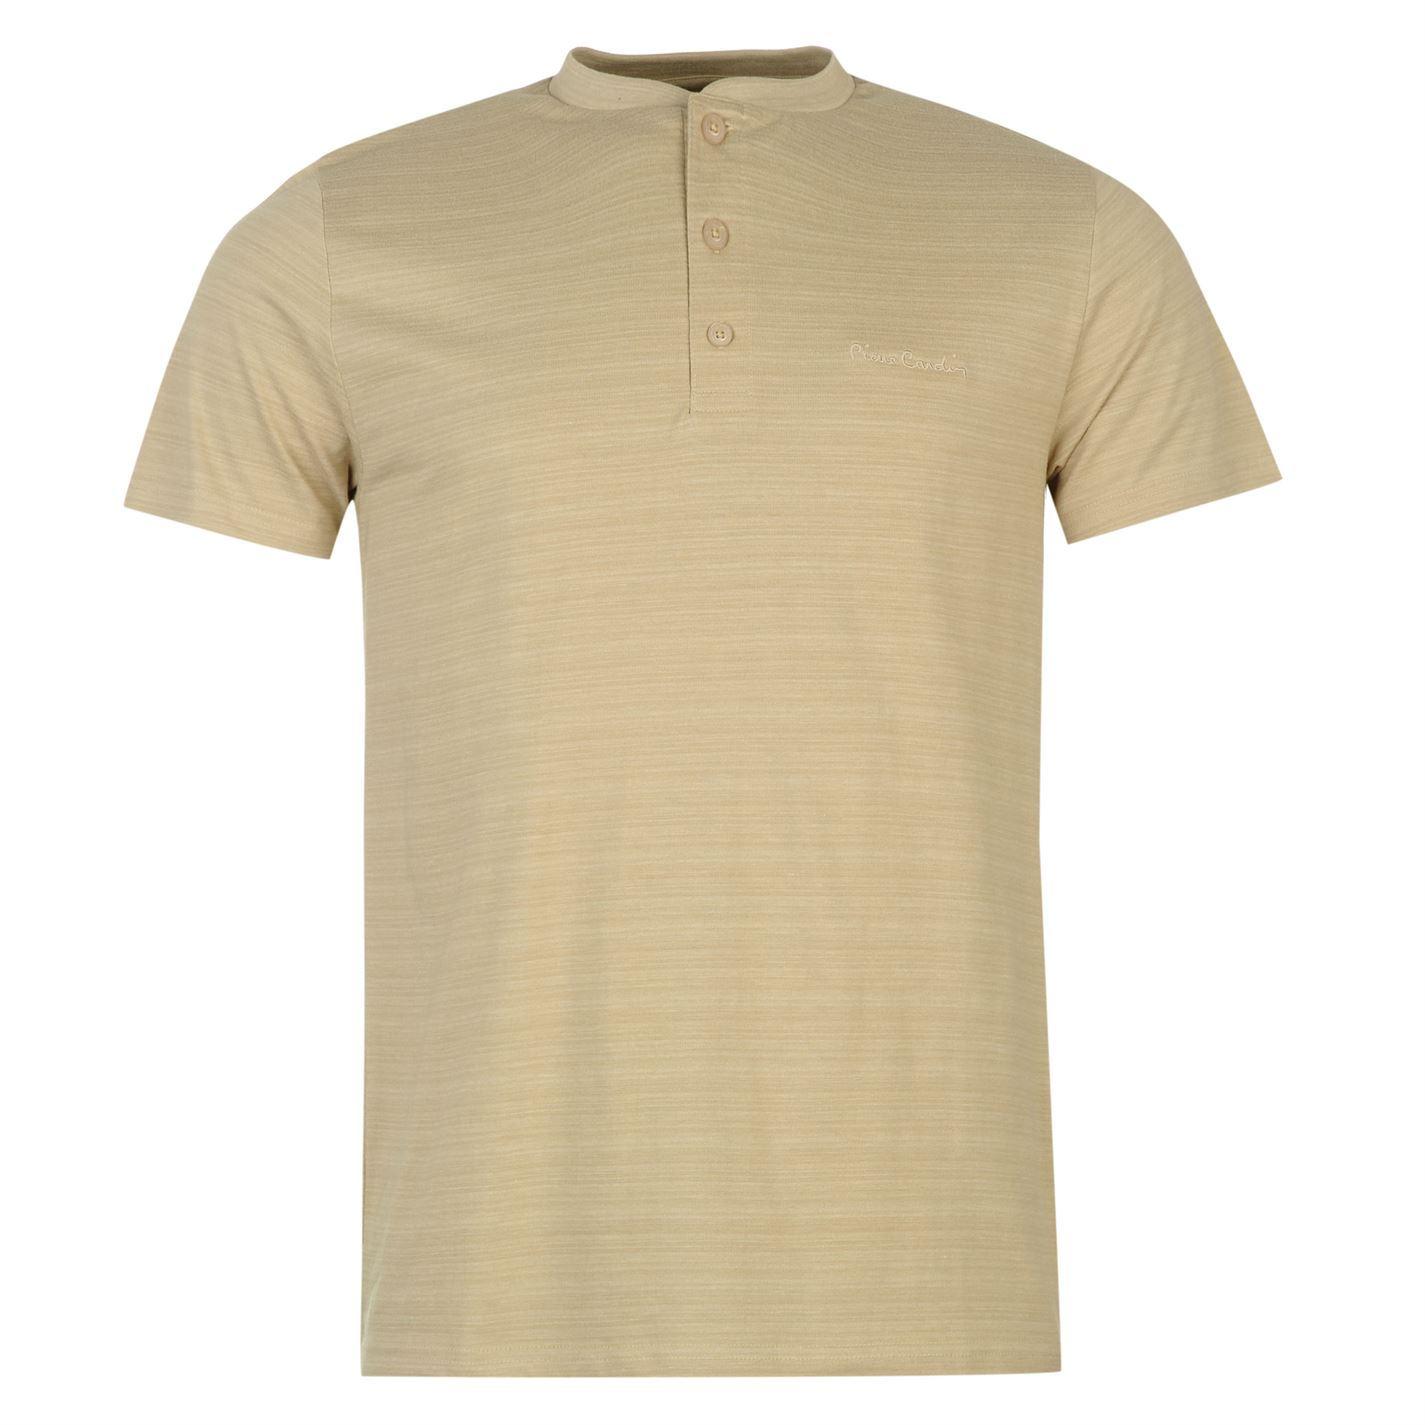 pierre cardin henley t shirt mens ecru top tee shirt ebay. Black Bedroom Furniture Sets. Home Design Ideas